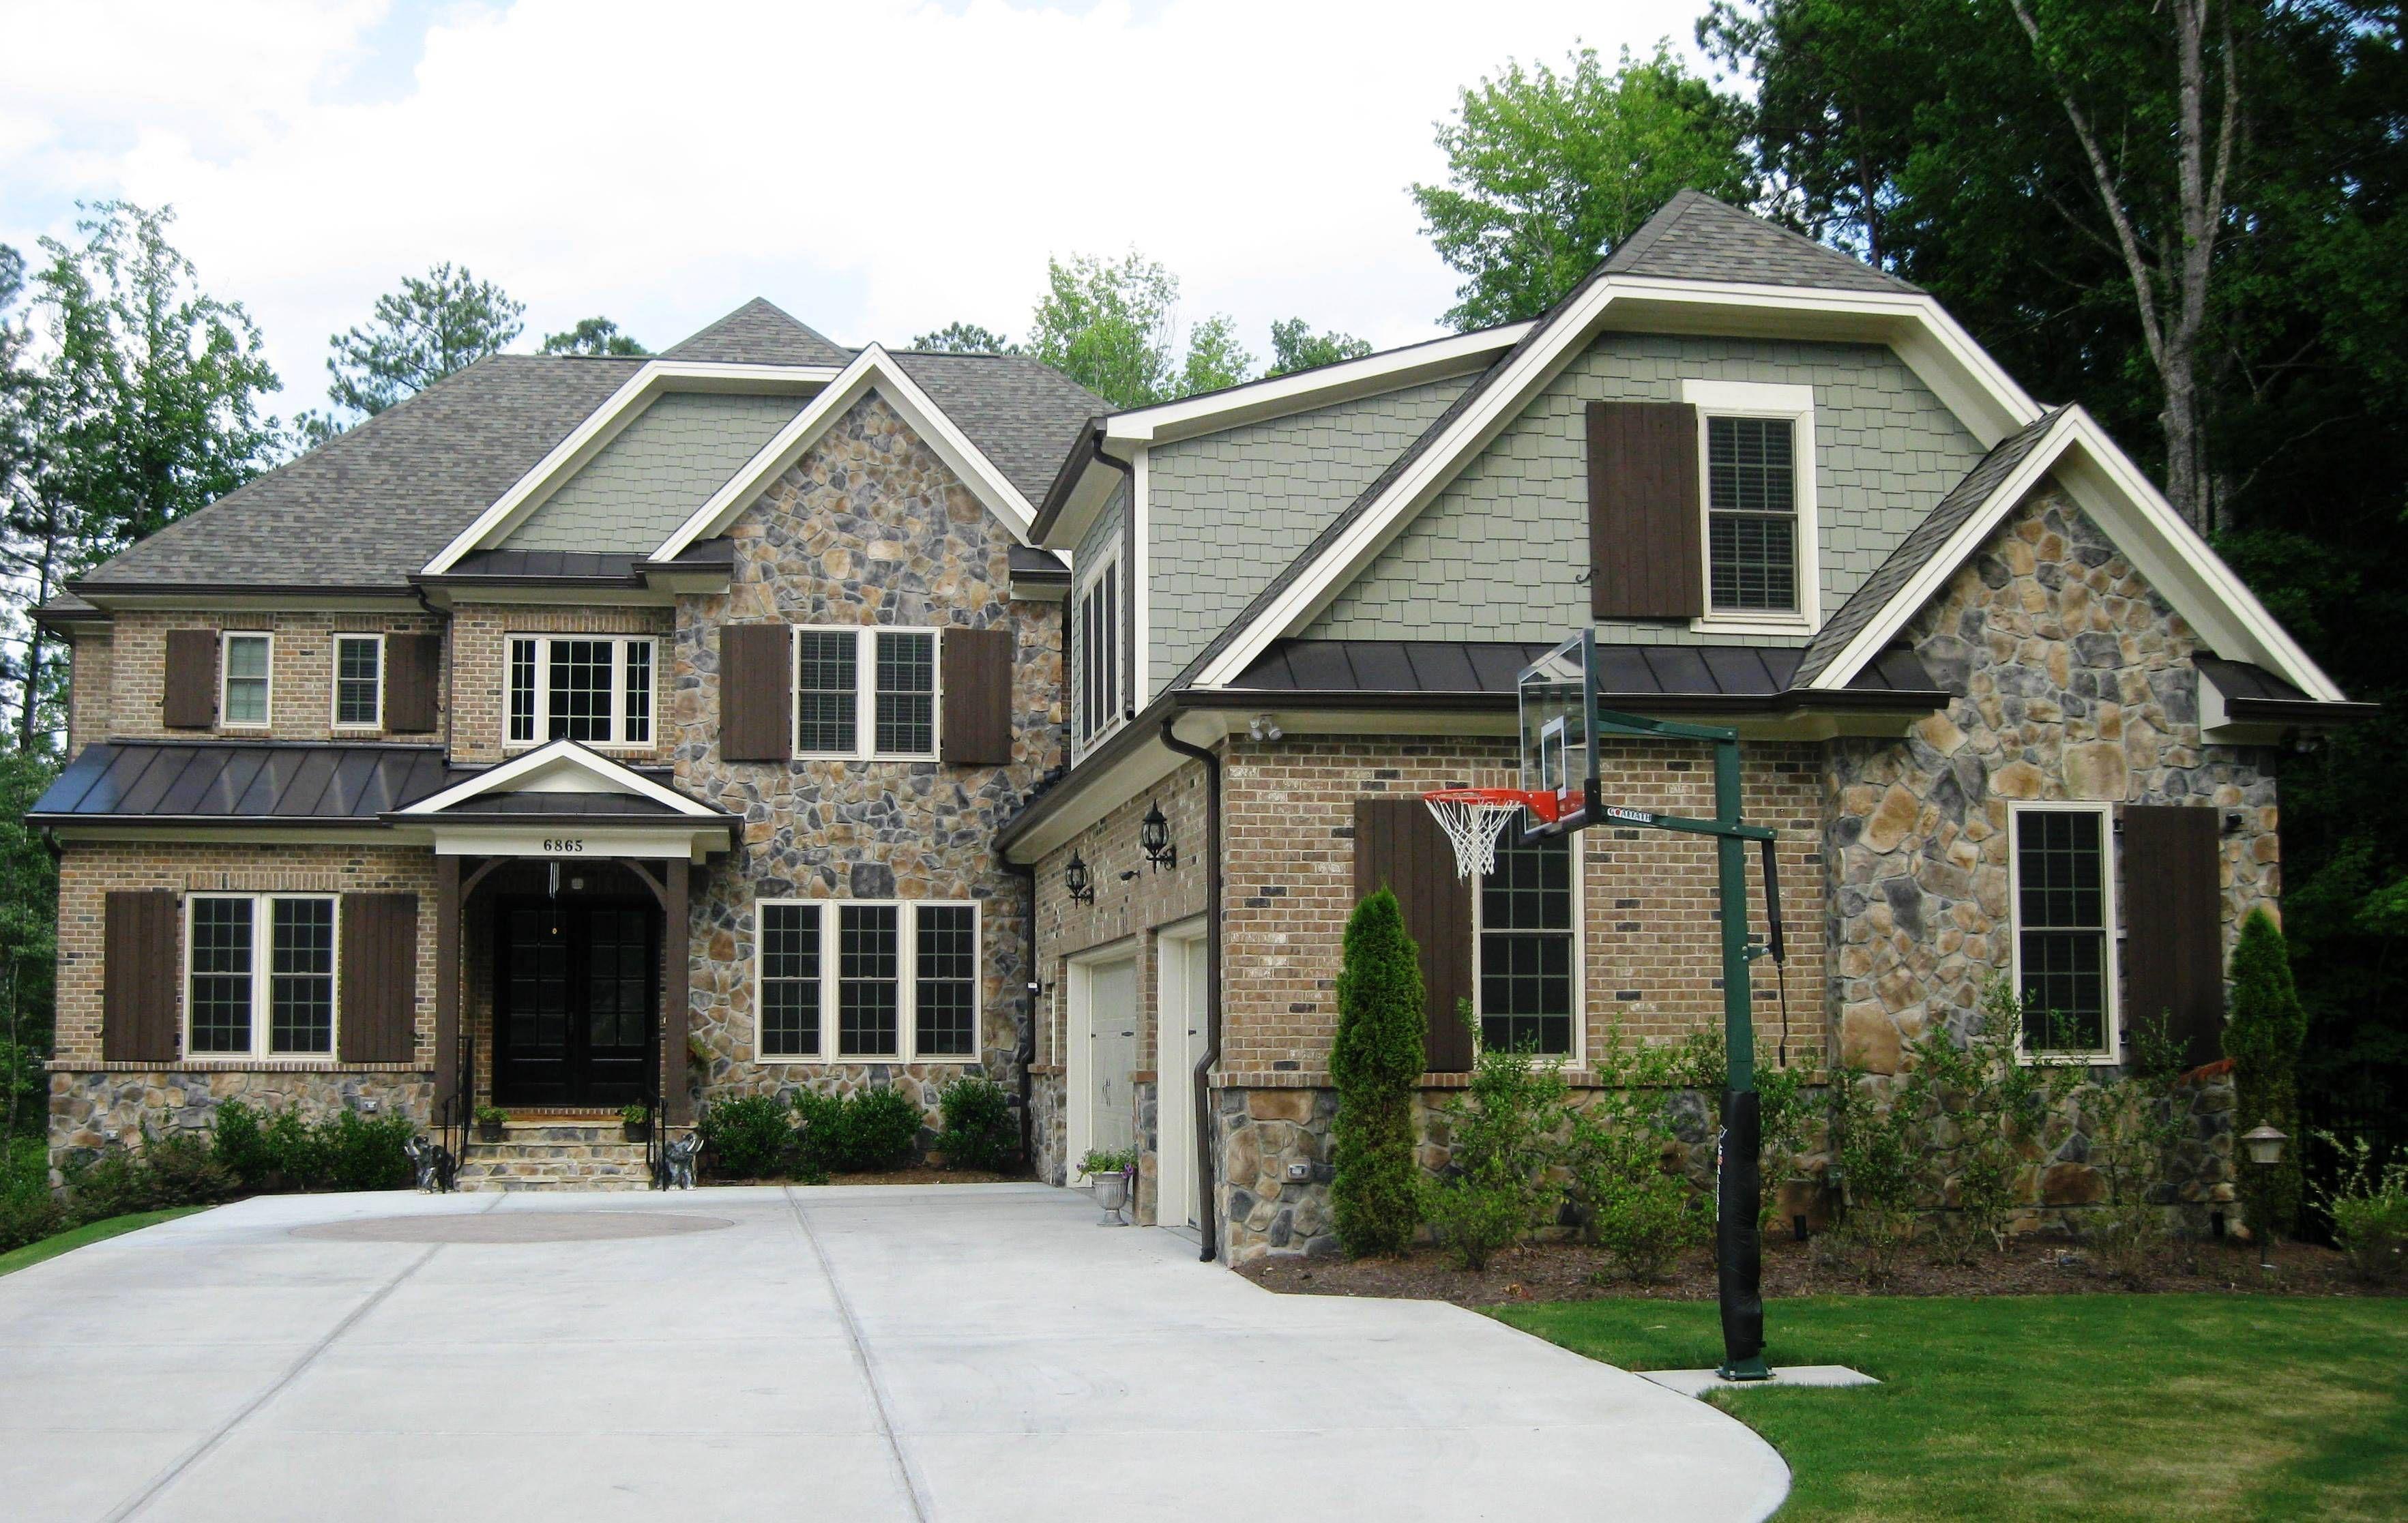 Stone - Colorado Fieldstone | Residential Homes | Pinterest